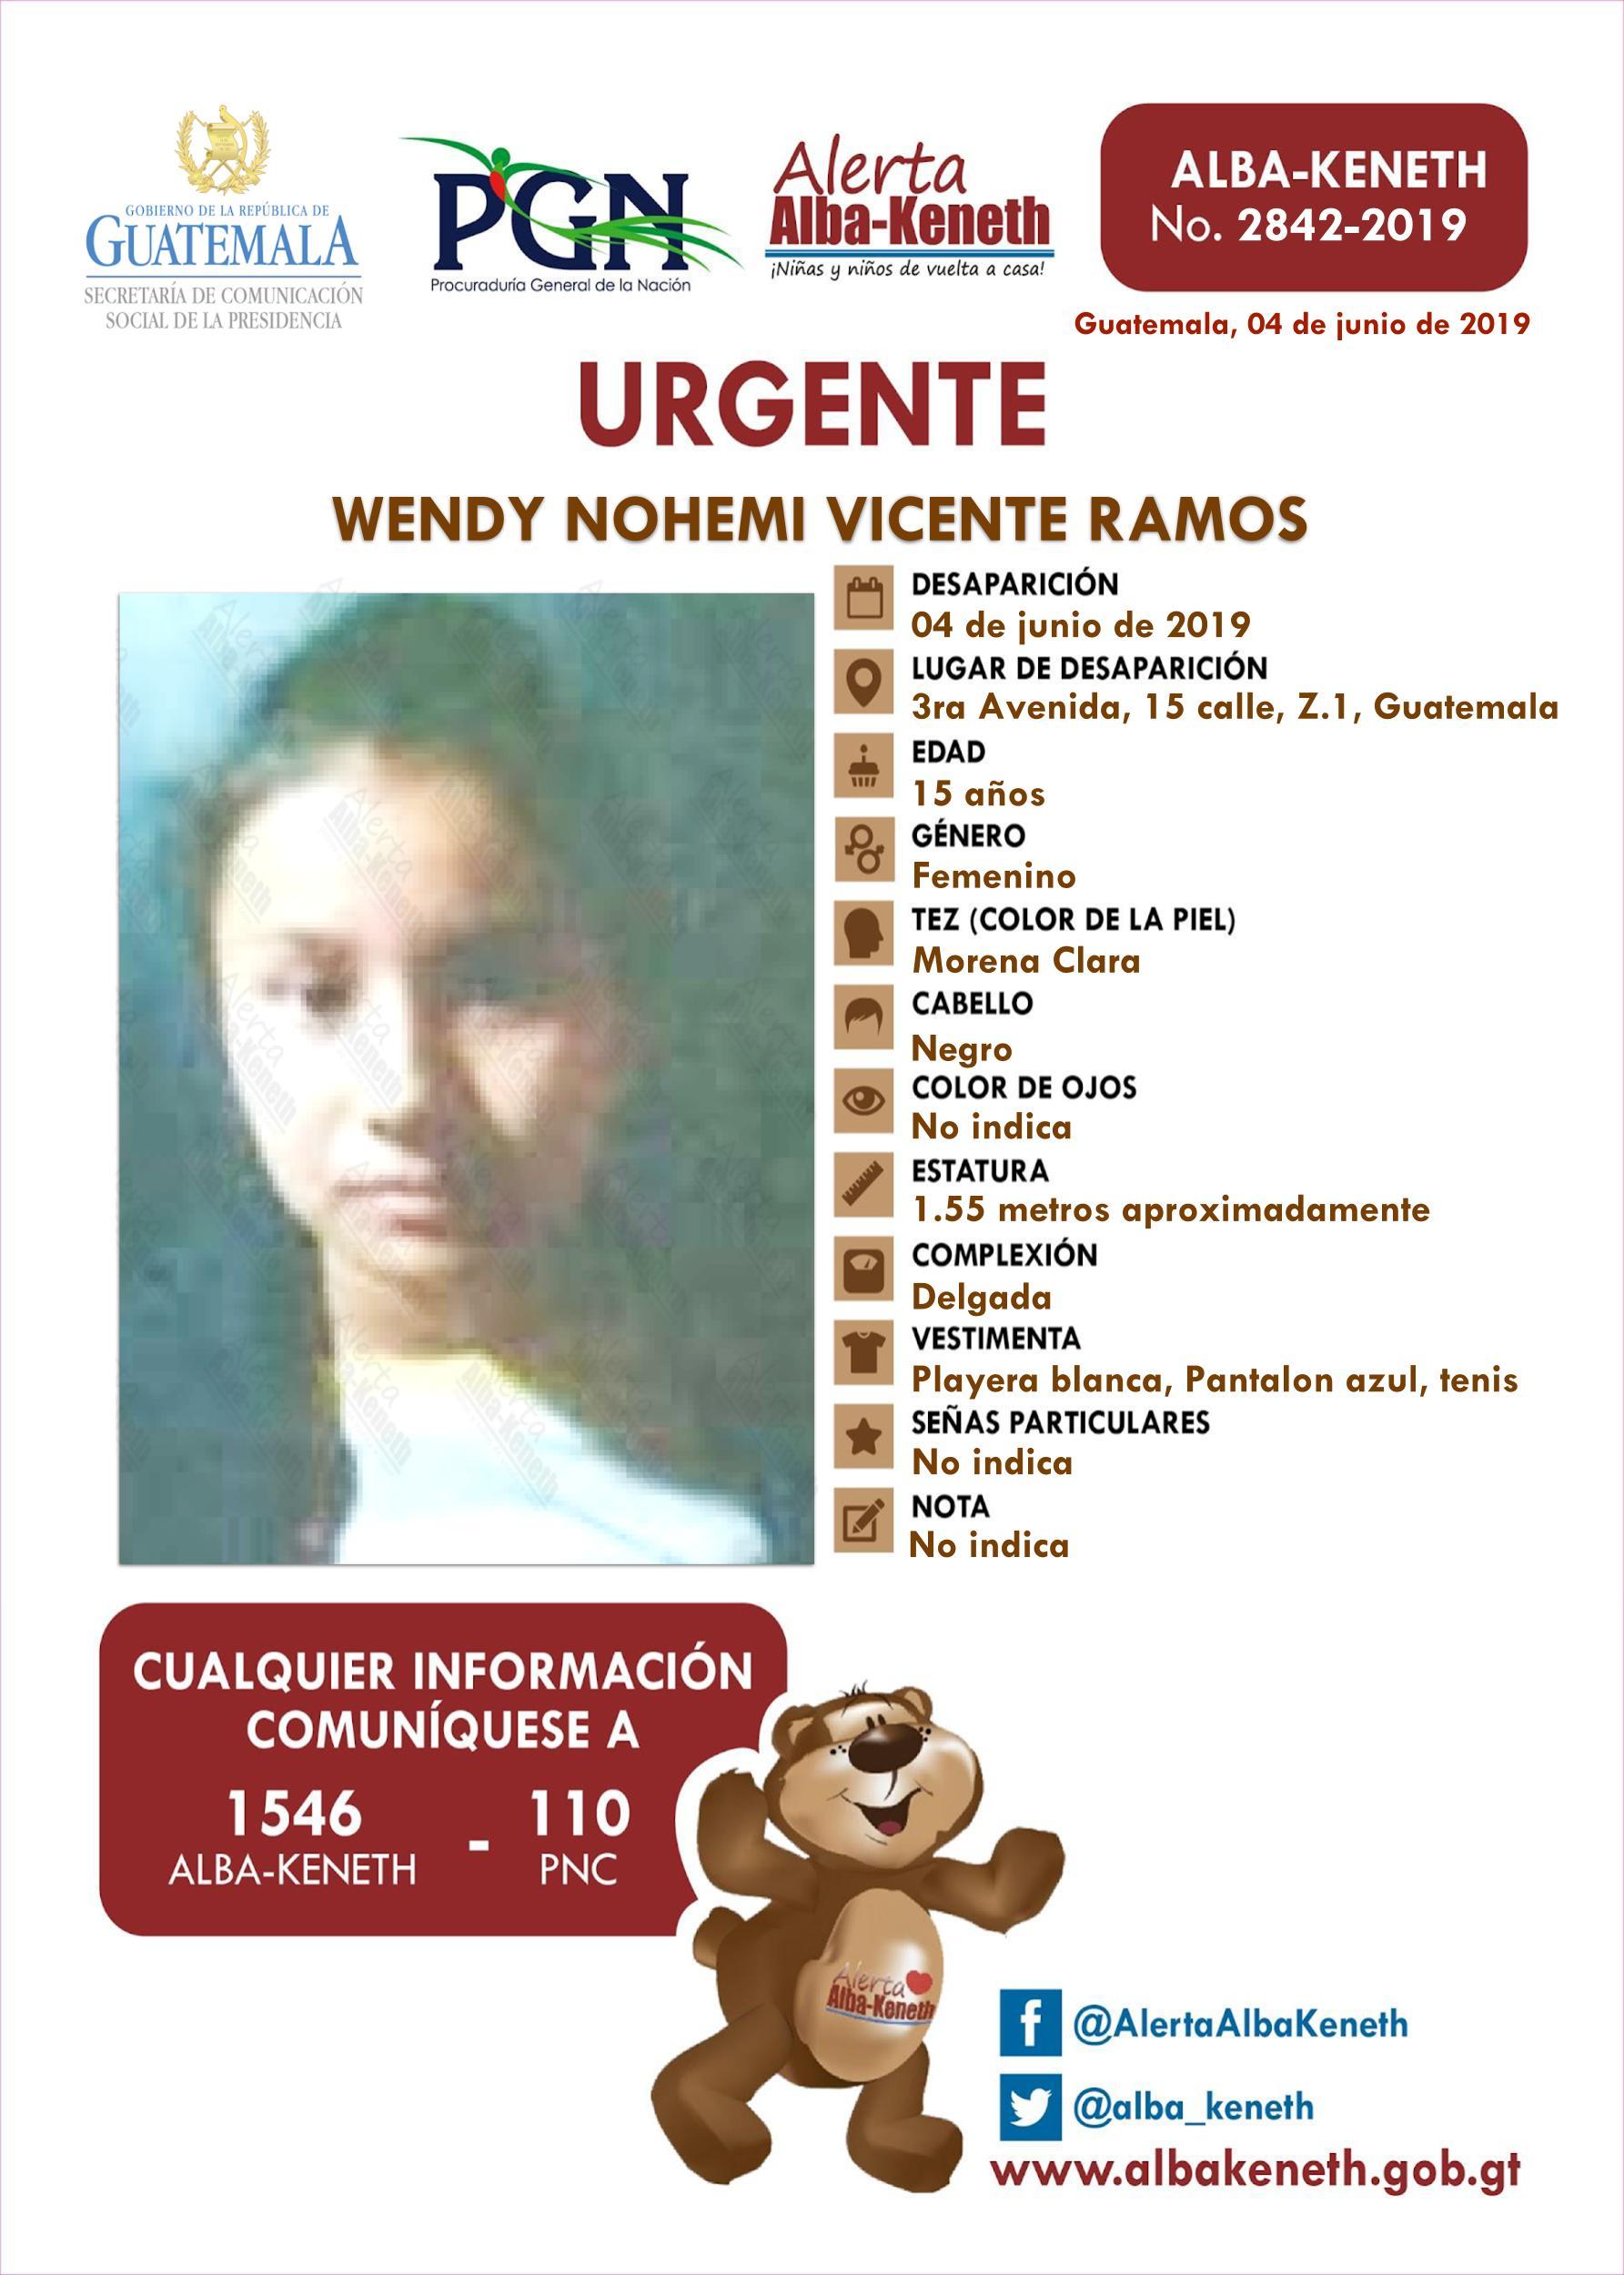 Wendy Nohemi Vicente Ramos